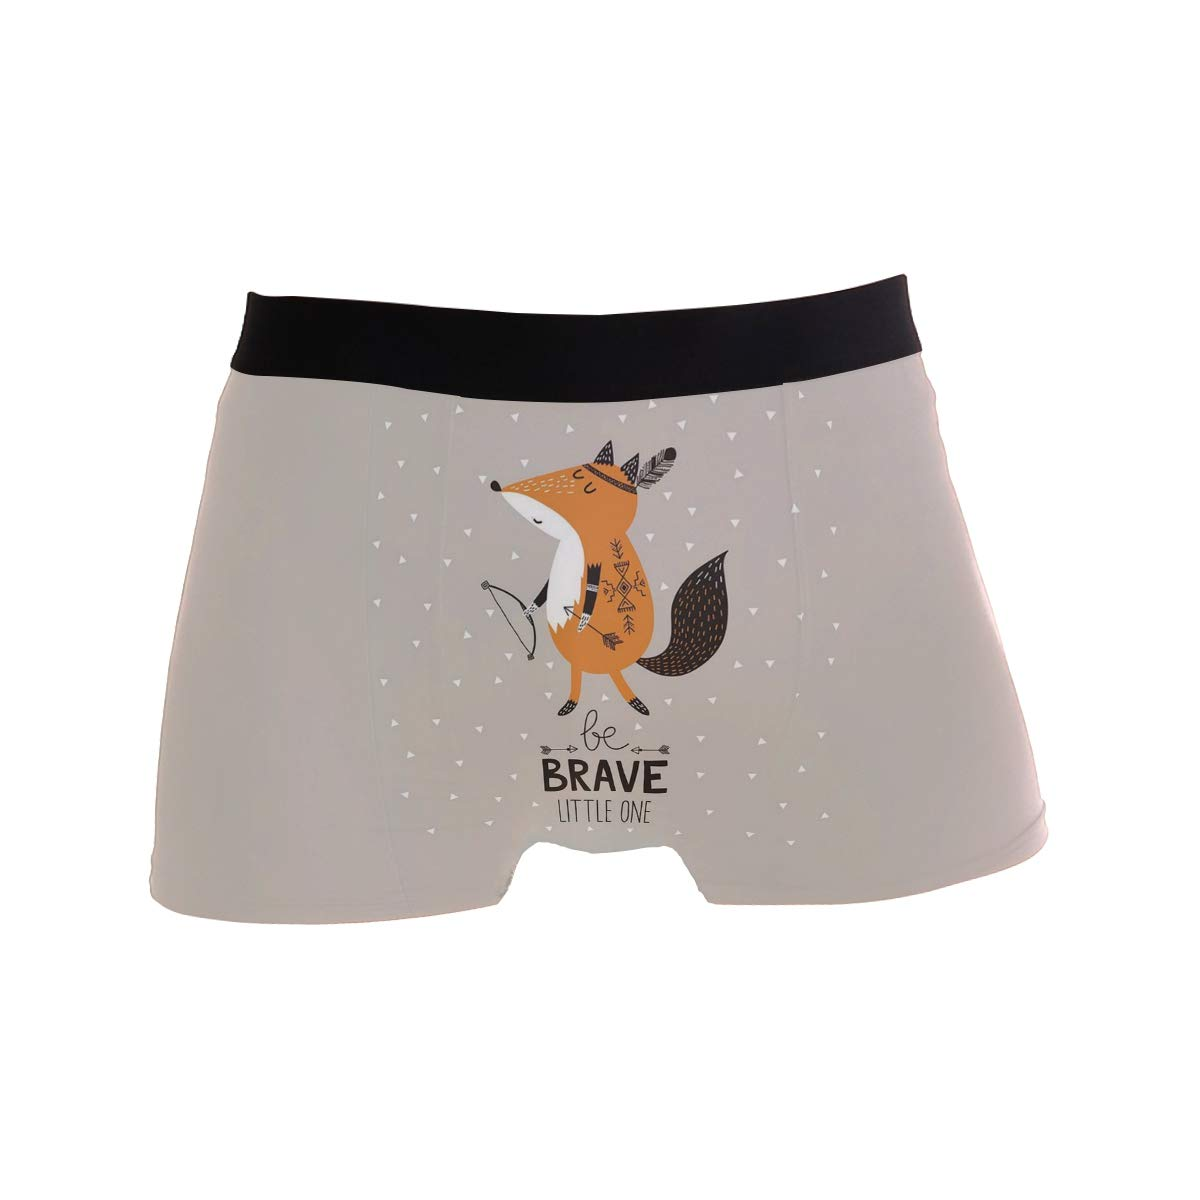 Cartoon Fox Be Brave Quotes Boxer Briefs Mens Underwear Pack Seamless Comfort Soft